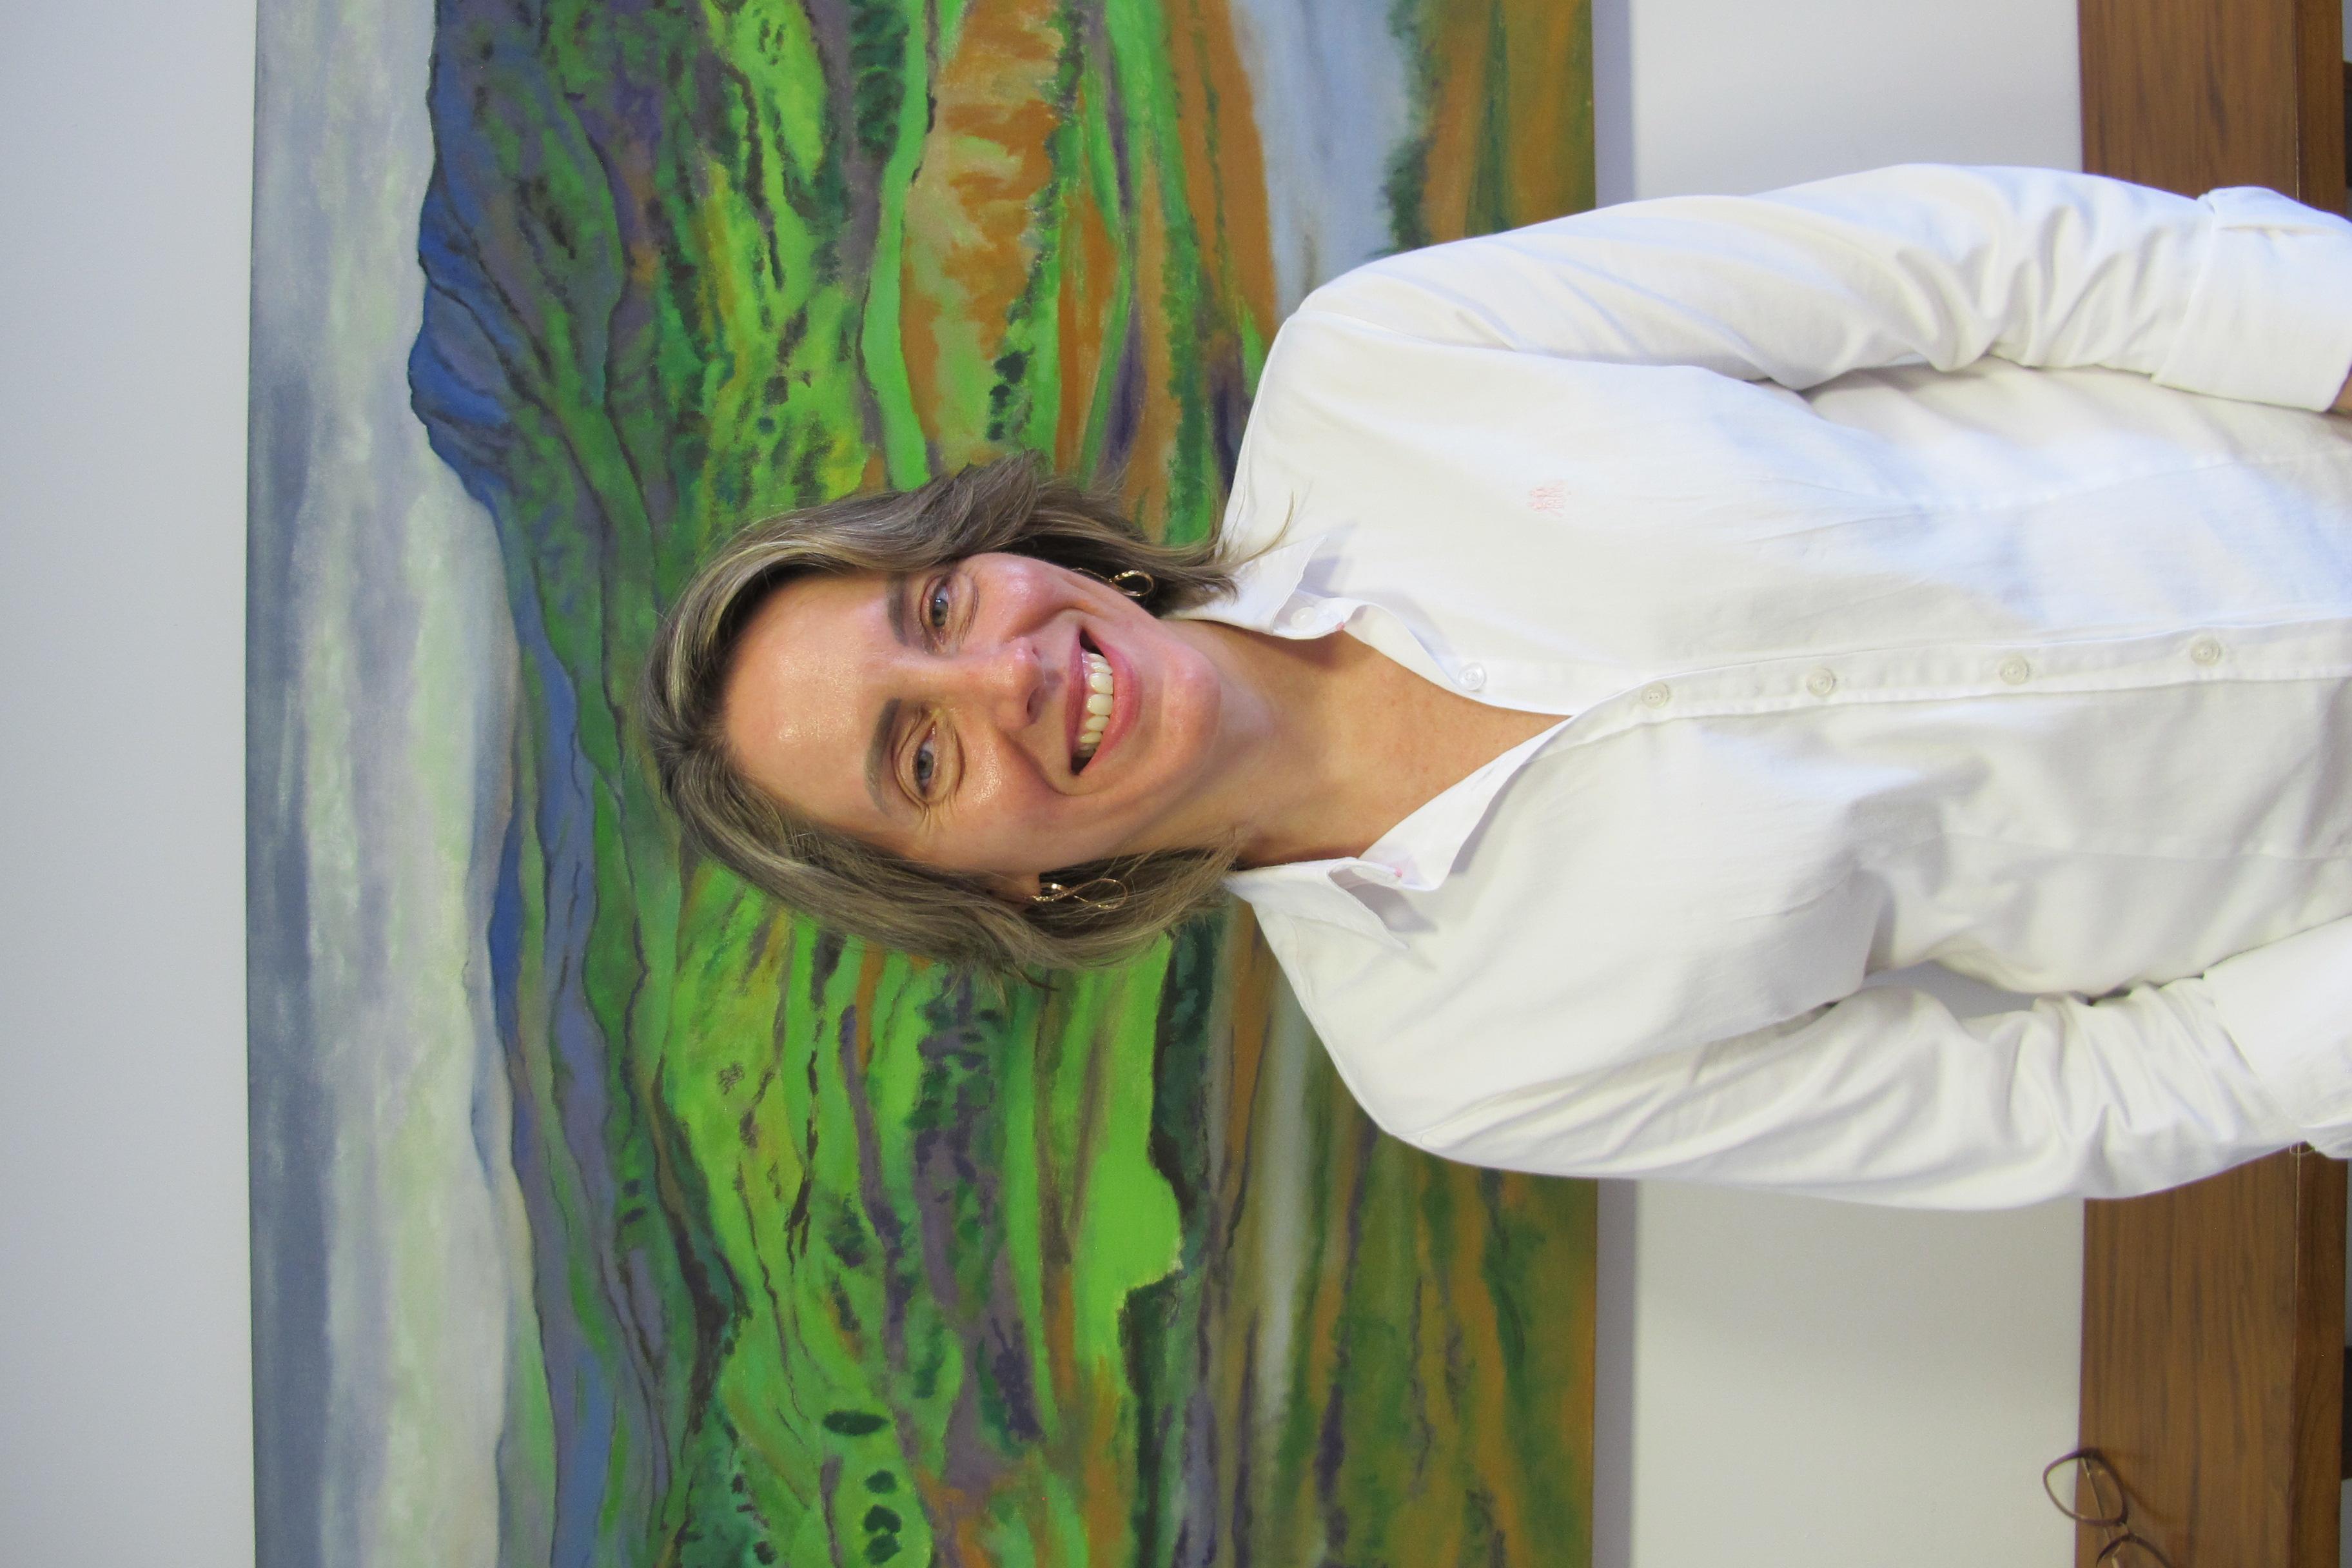 Dra. Anne Marie Mader